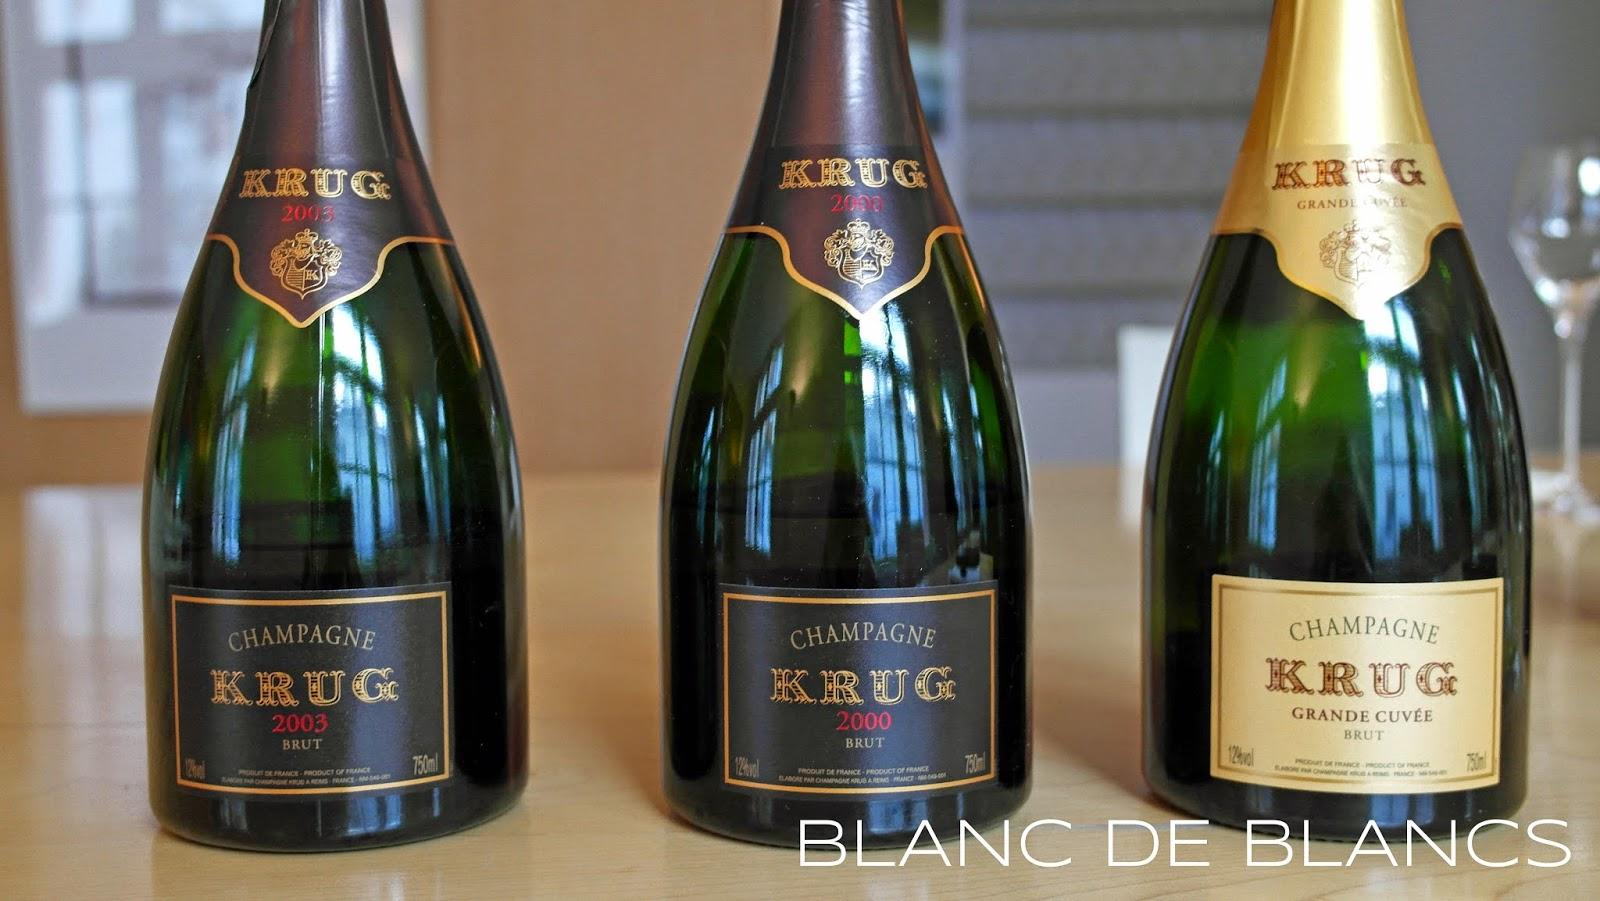 Krug - www.blancdeblancs.fi